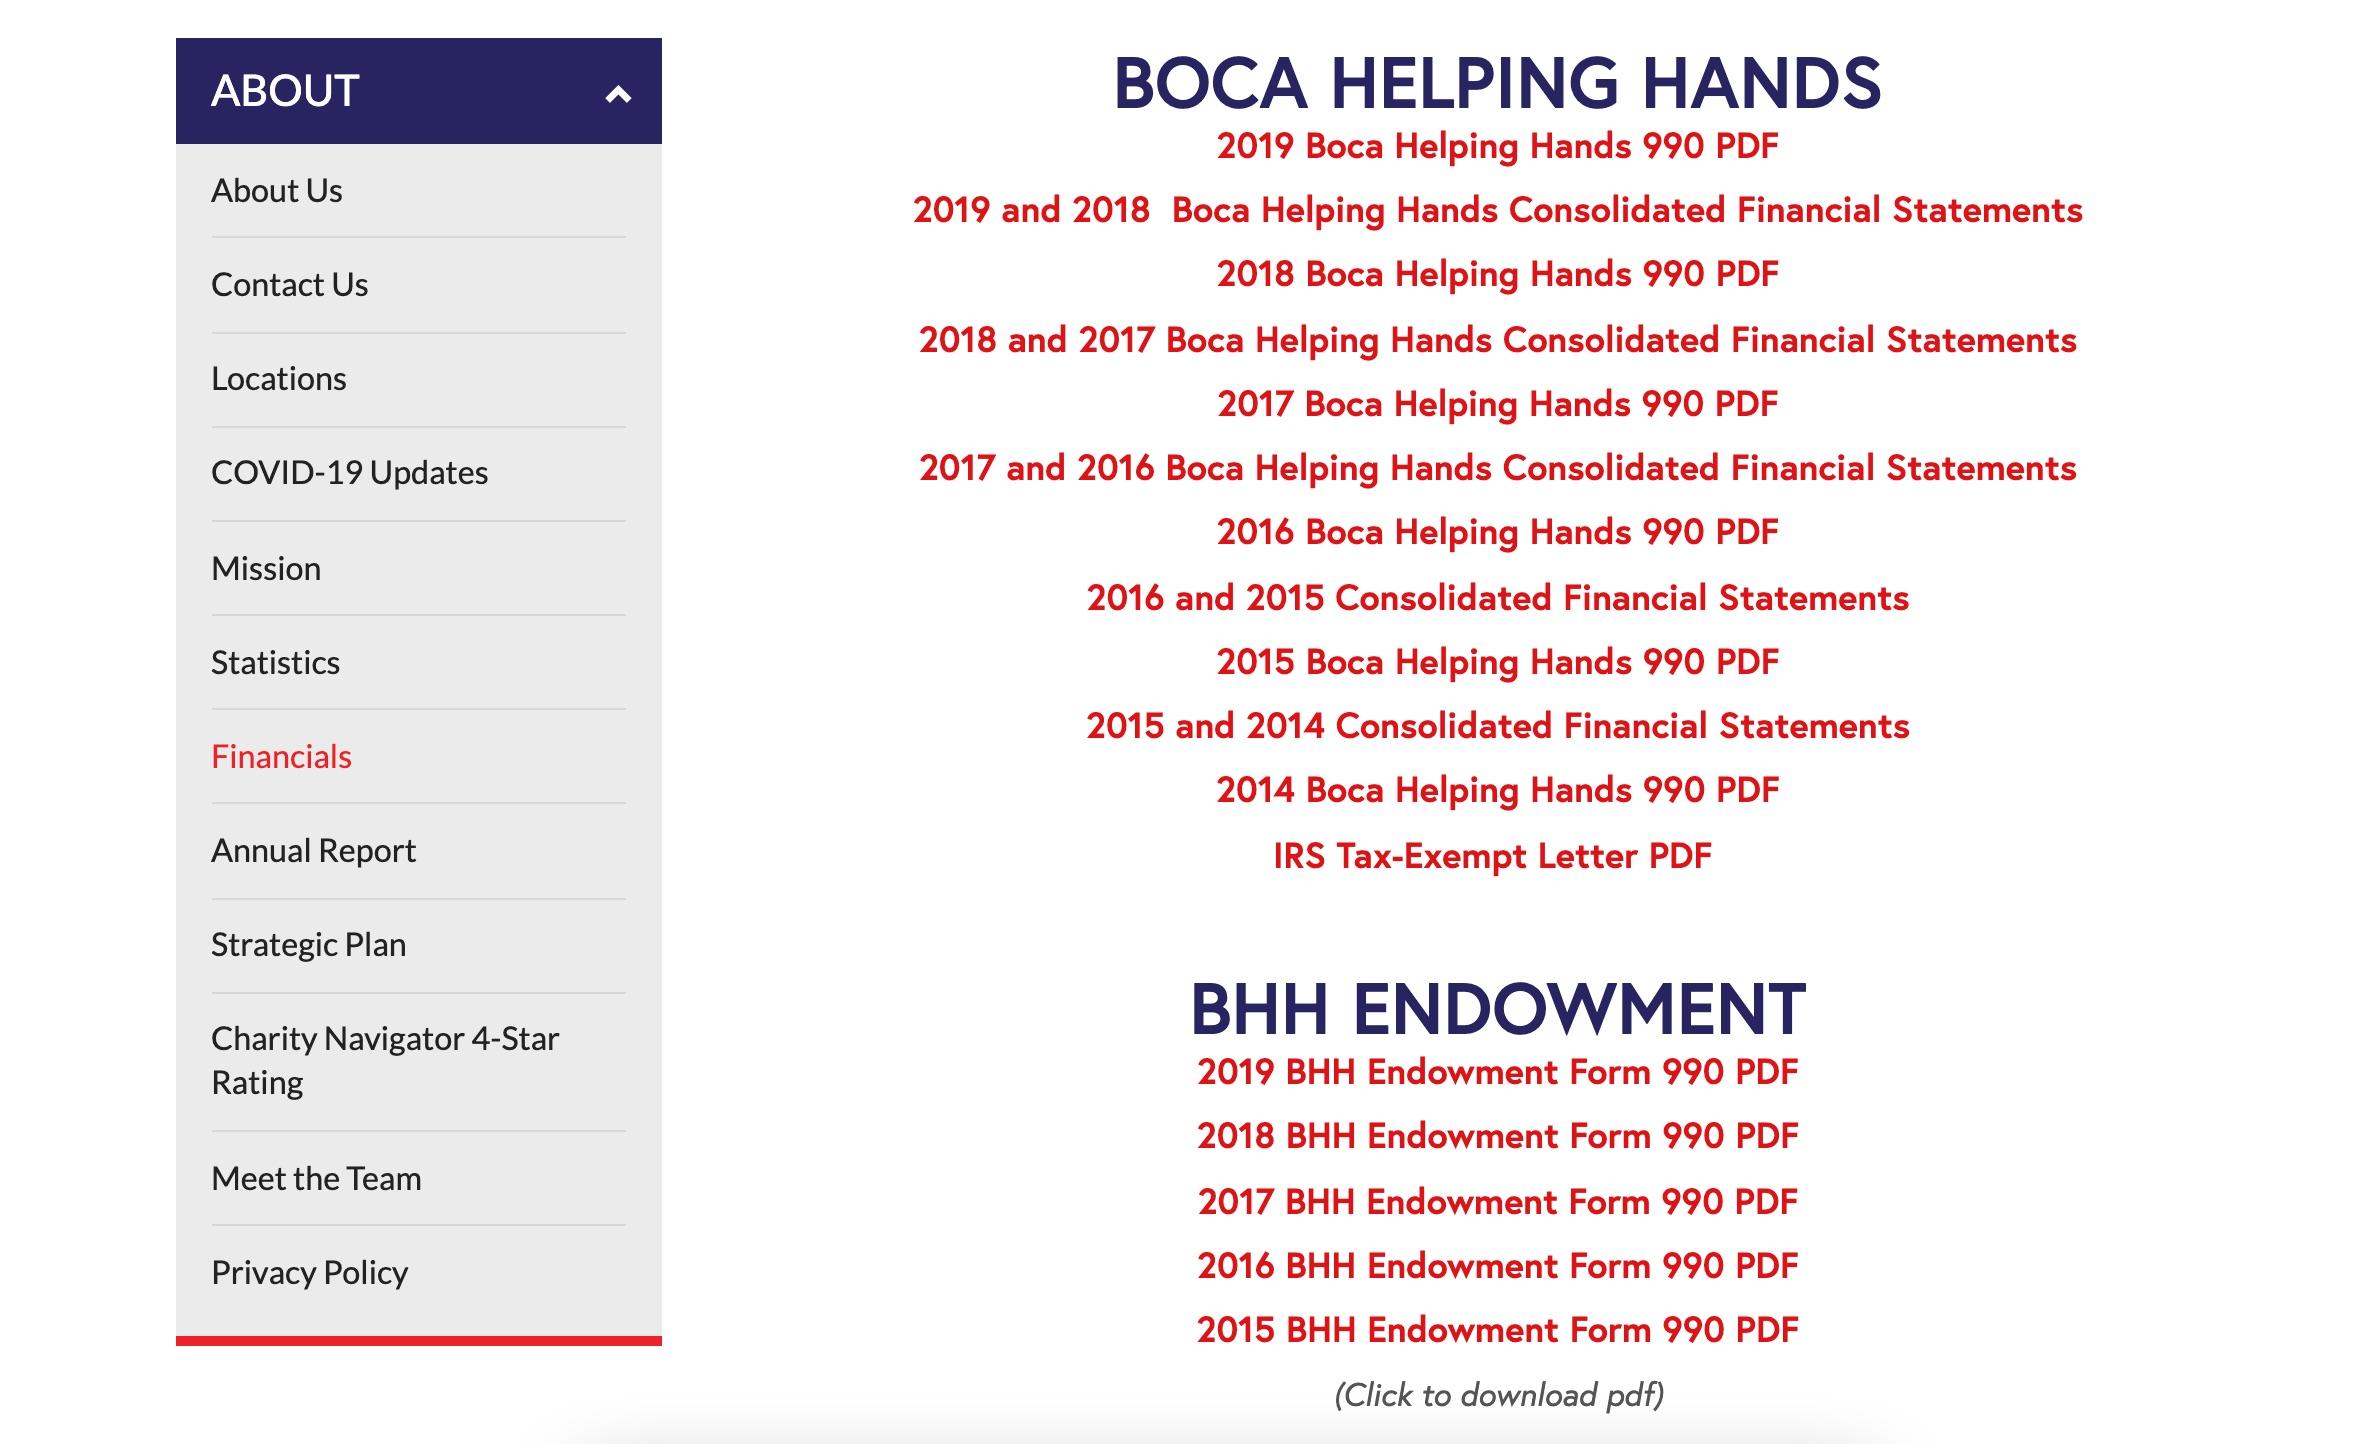 BOCA Helping Hands financials